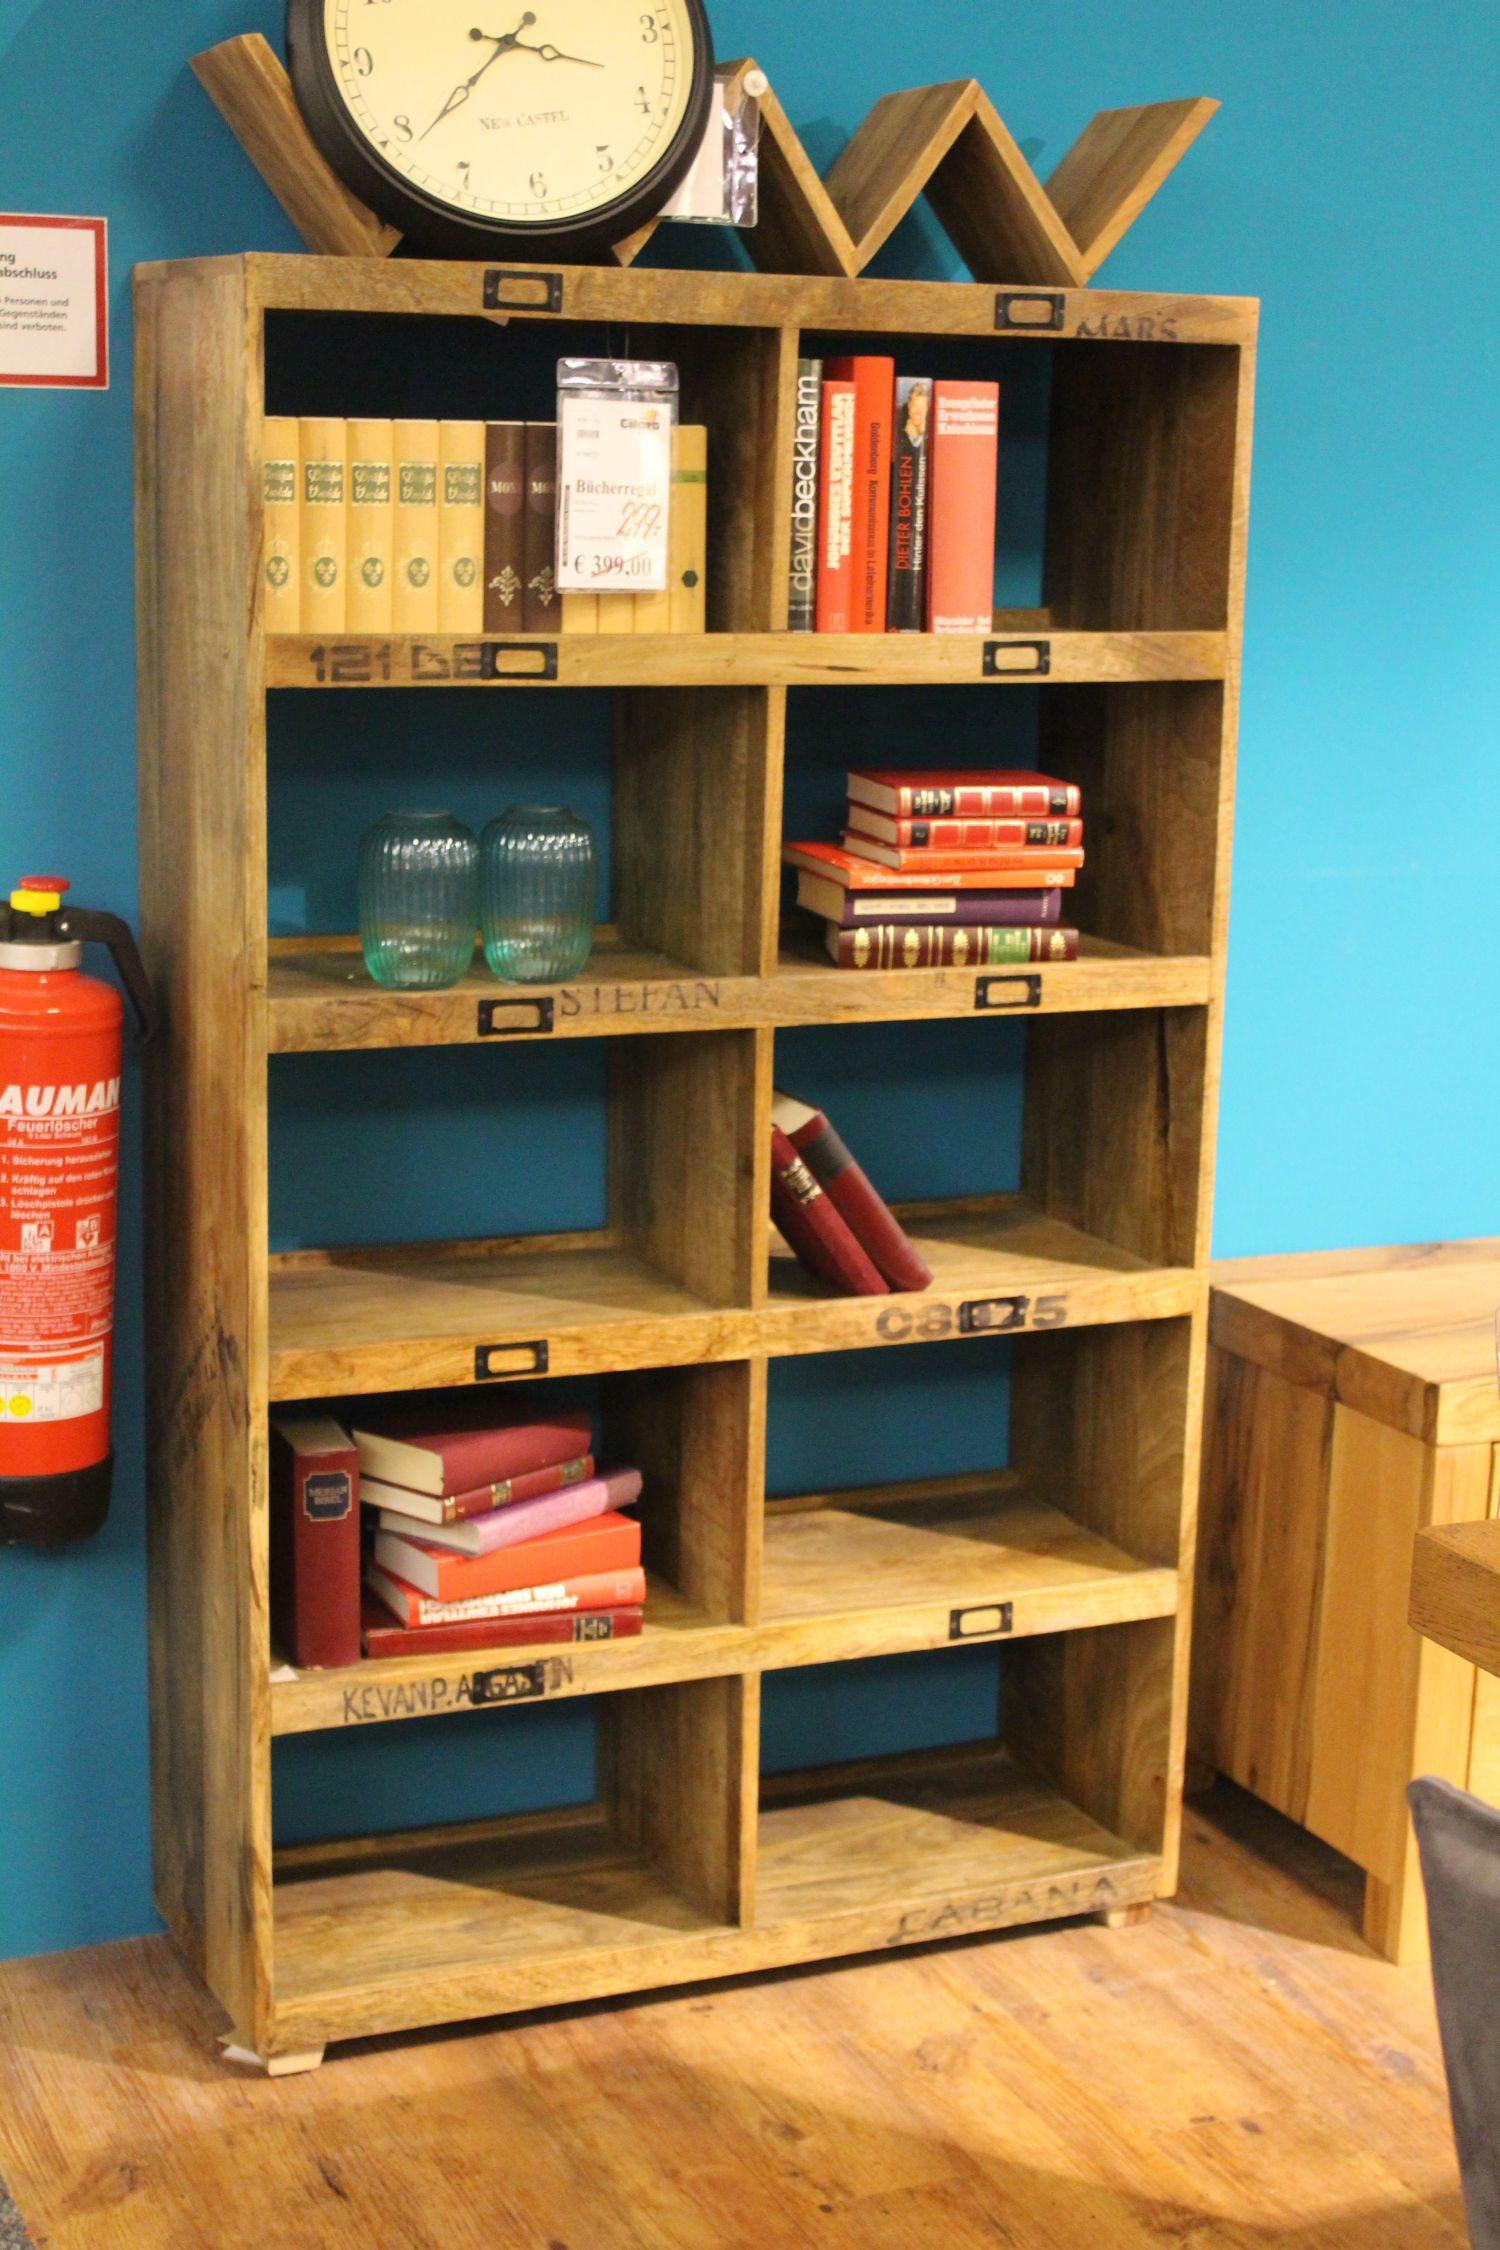 Möbel Eilers Apen | Möbel A-Z | Regale + Raumteiler | Bücherregale